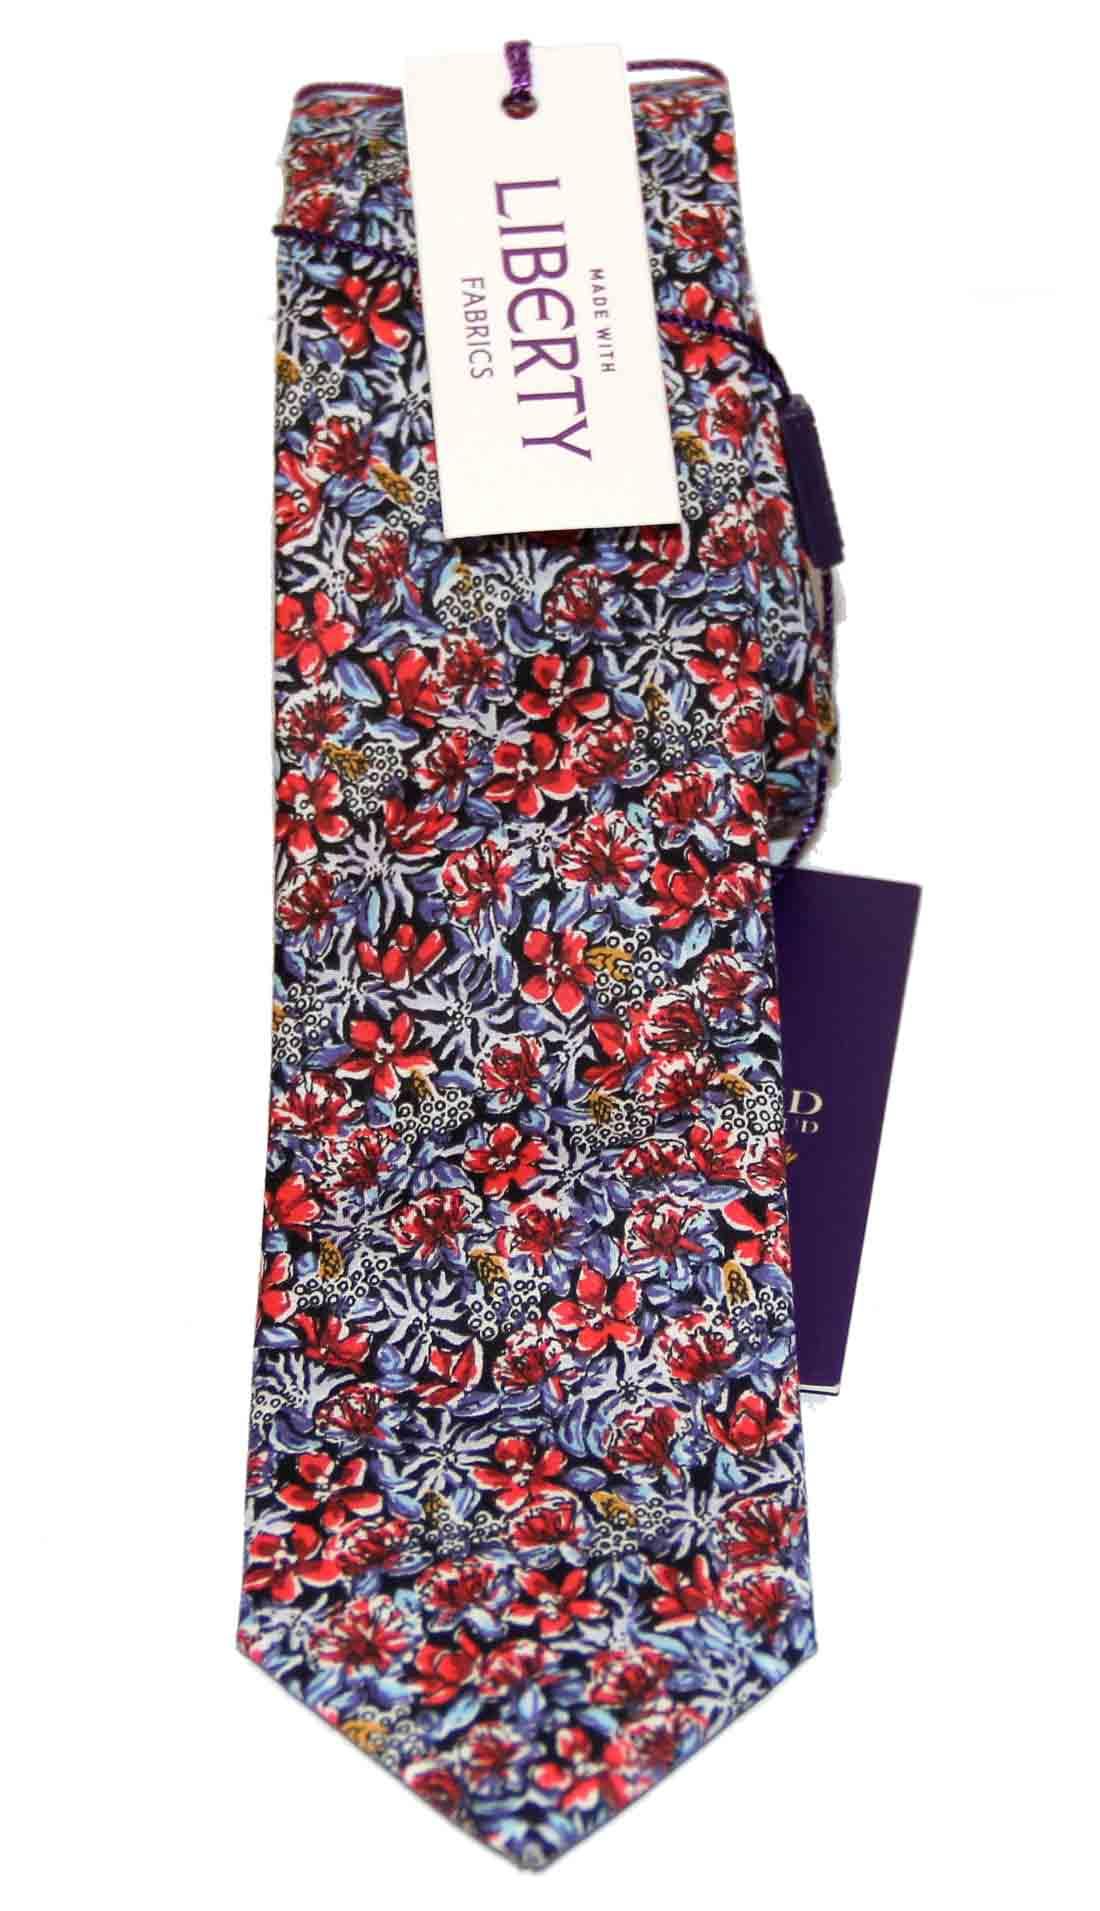 Feraud Liberty of London Fabric Cotton Tie Floral Narrow Men's